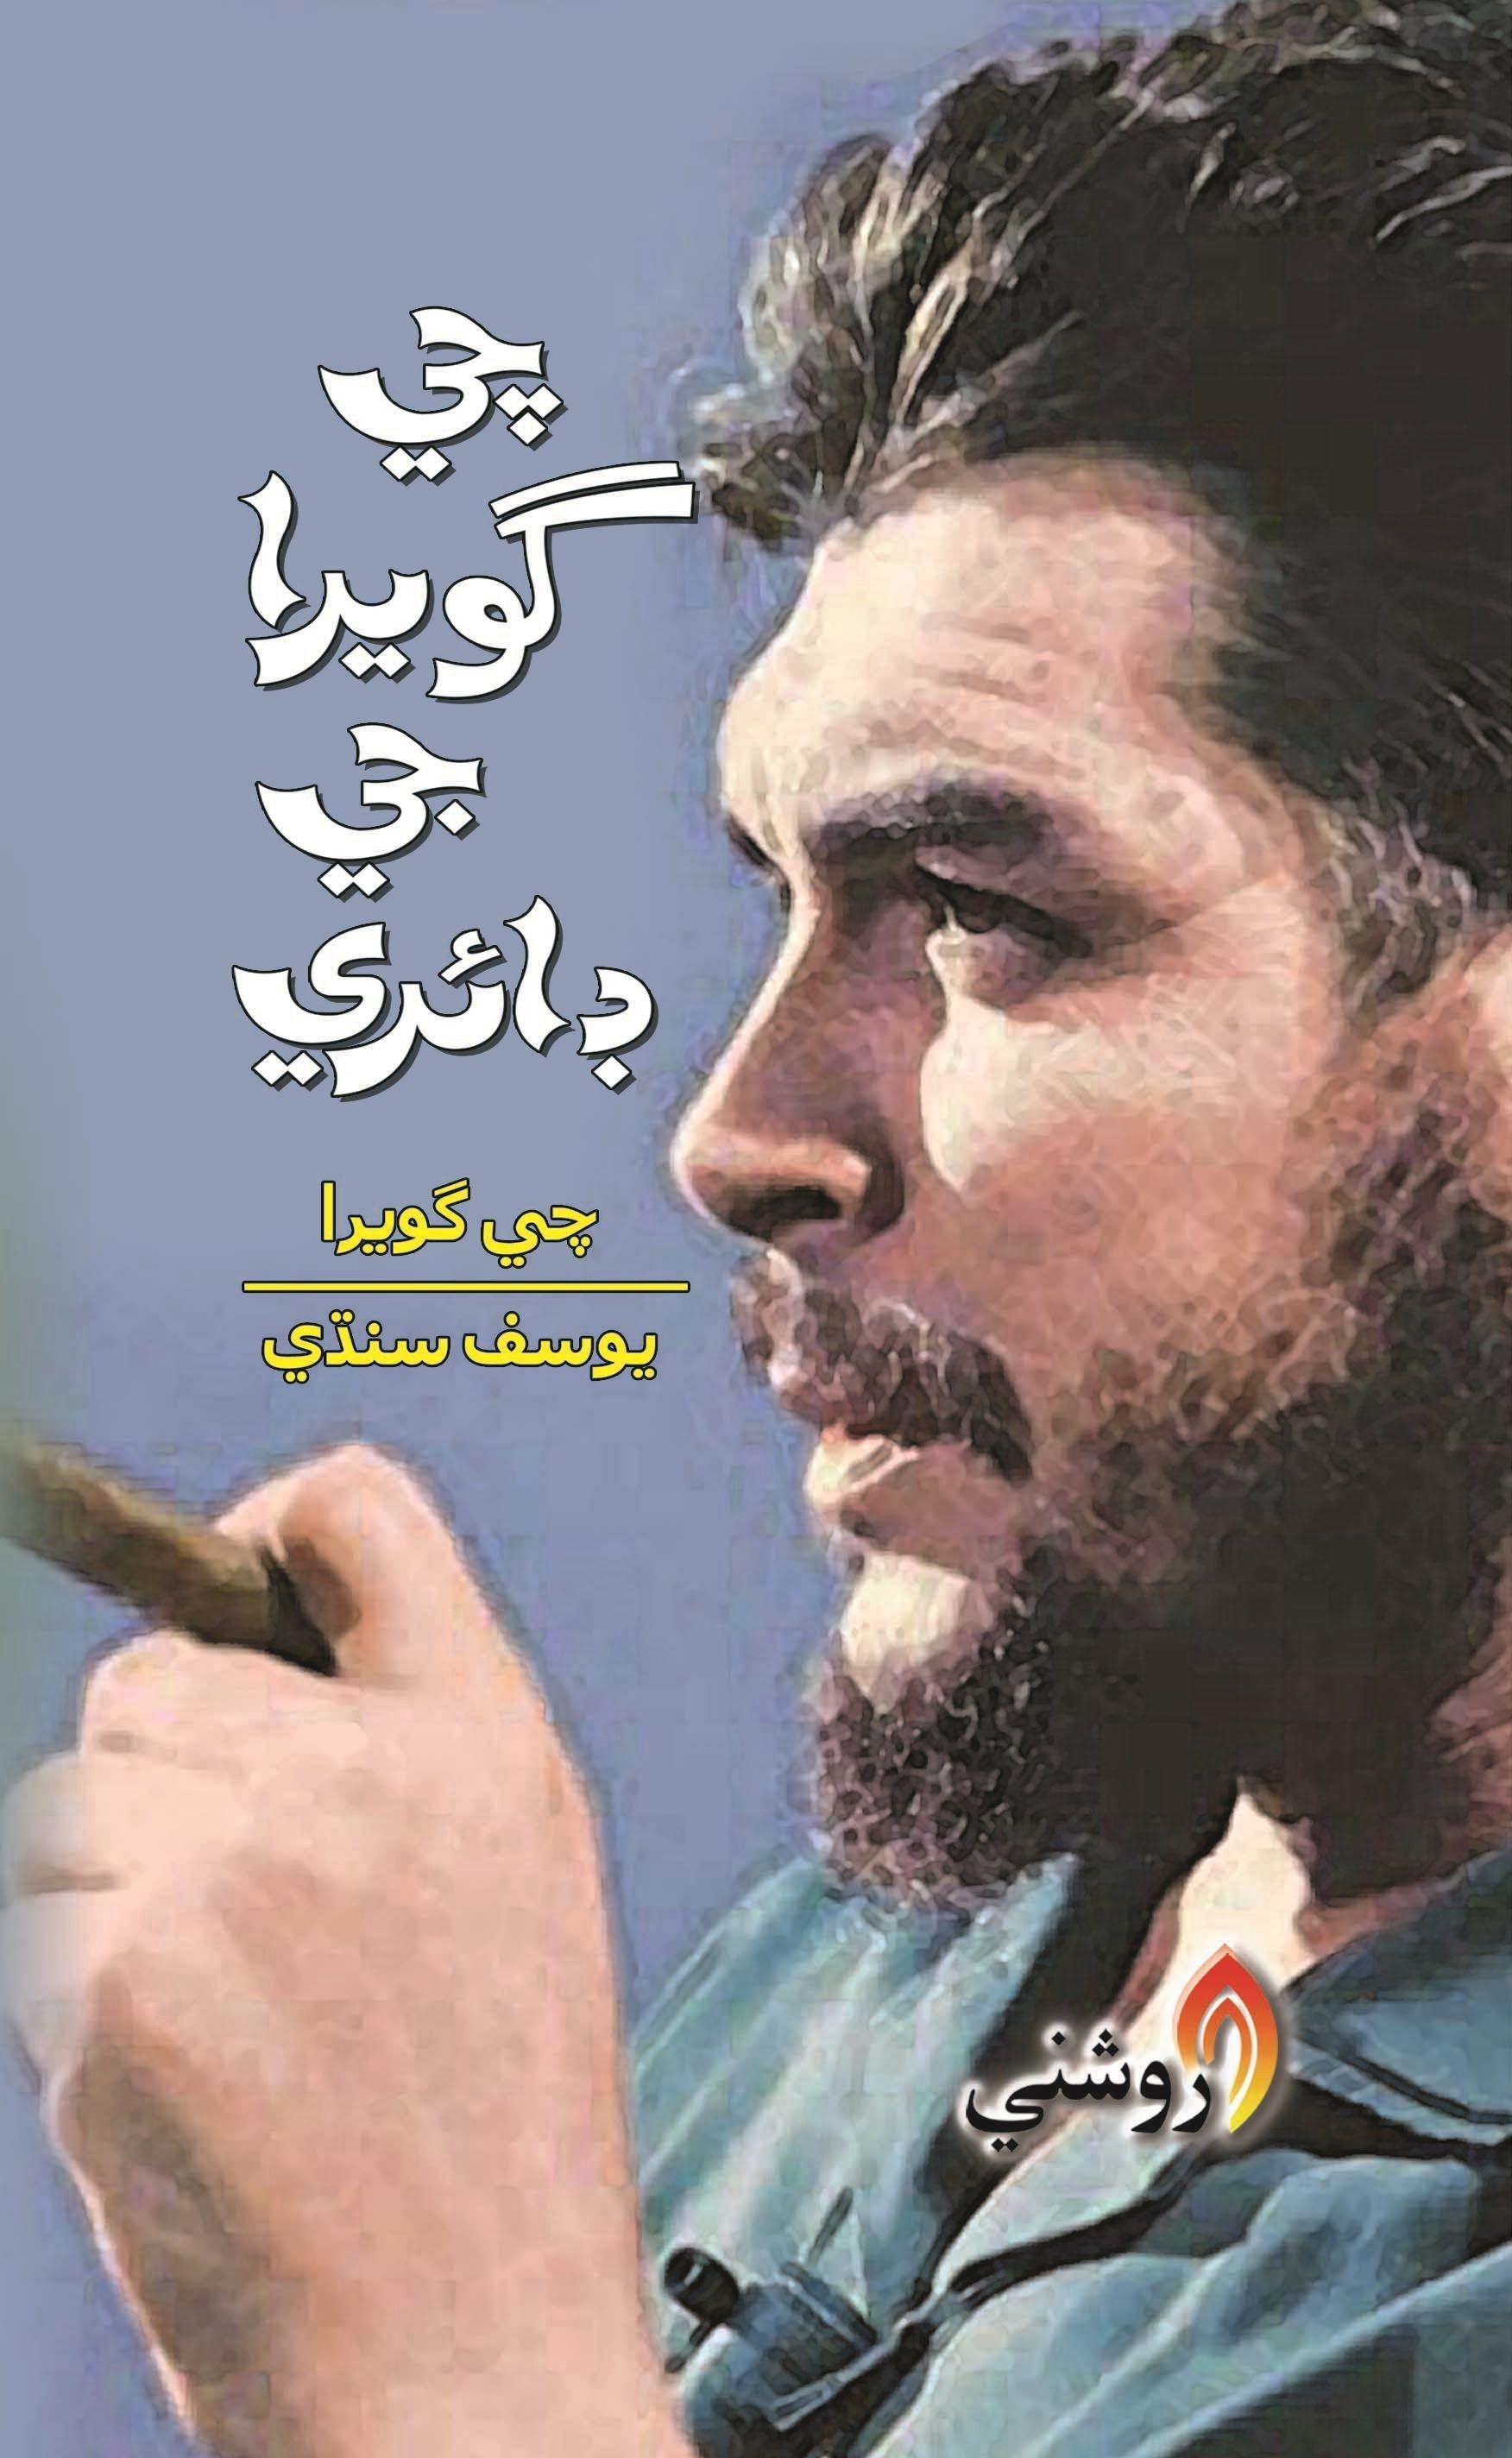 Che Guevara Jee Dairy (Biography) #cheguevara #cheguevara